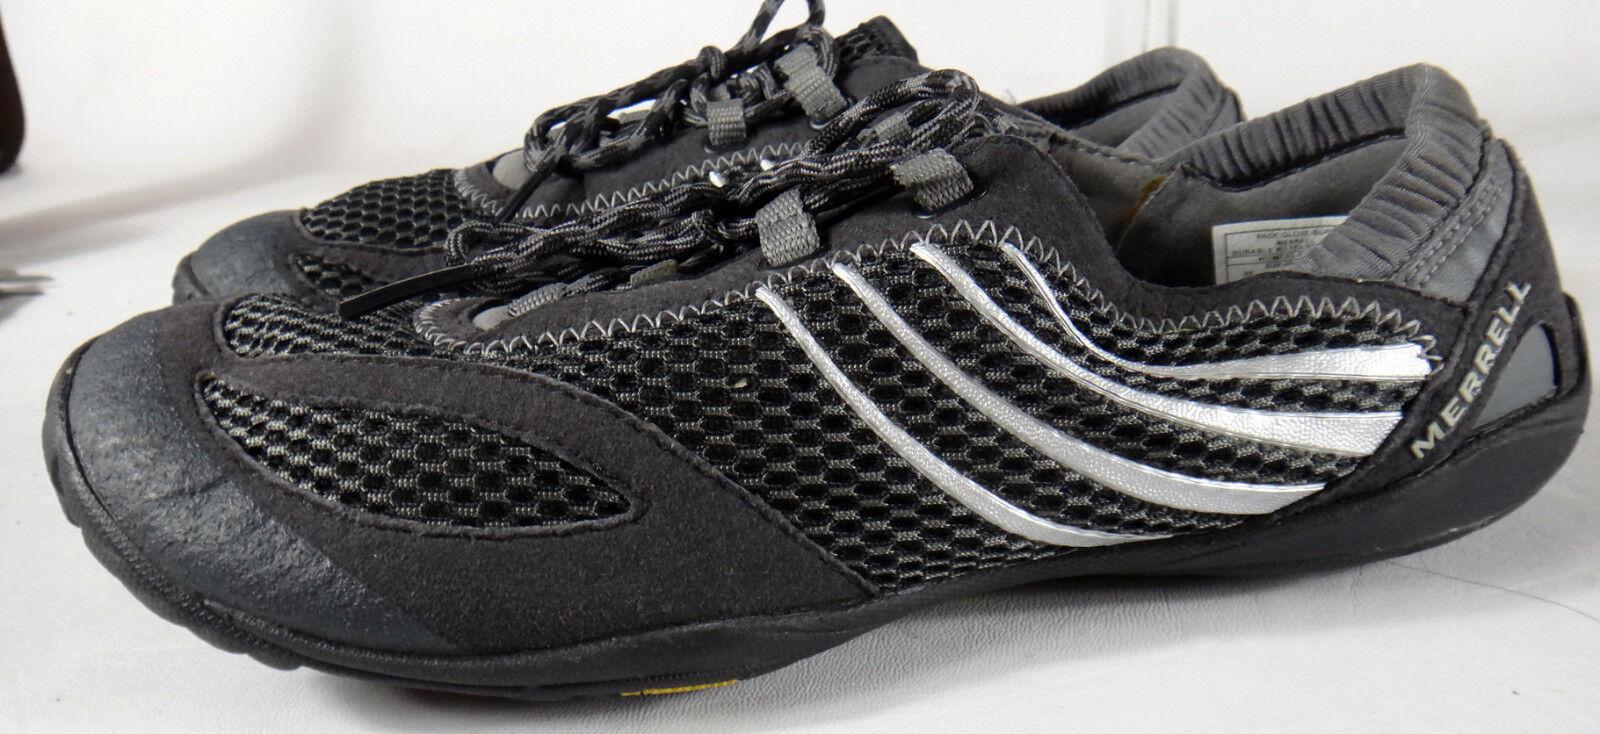 Merrell Vibram Barefoot running shoe black grey 9 40 glove pace women vegan